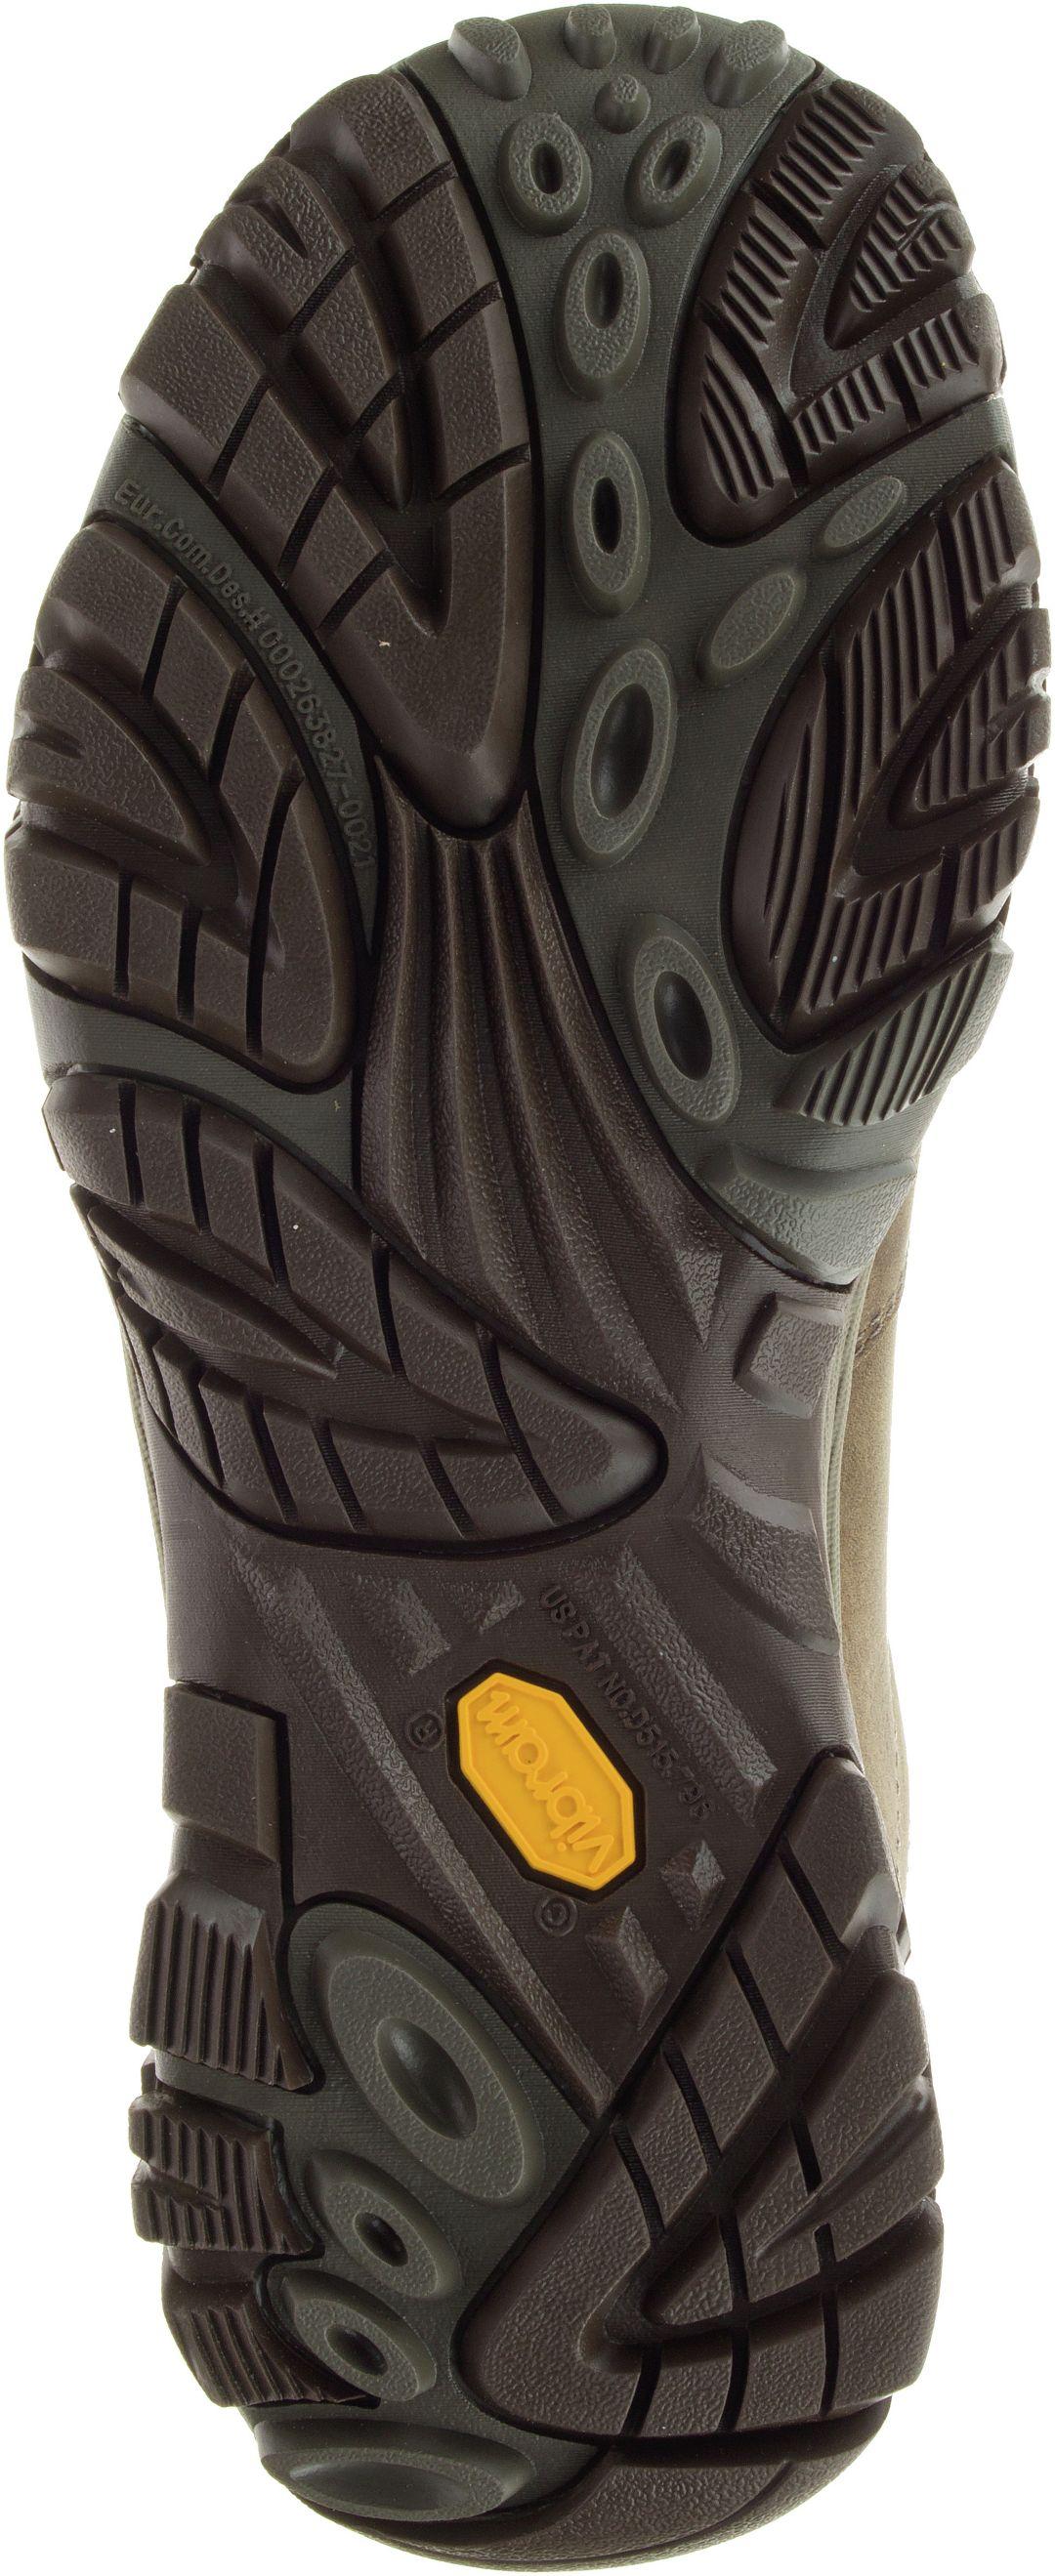 7f6e369659 Merrell Men's Moab Adventure Moc Casual Shoes